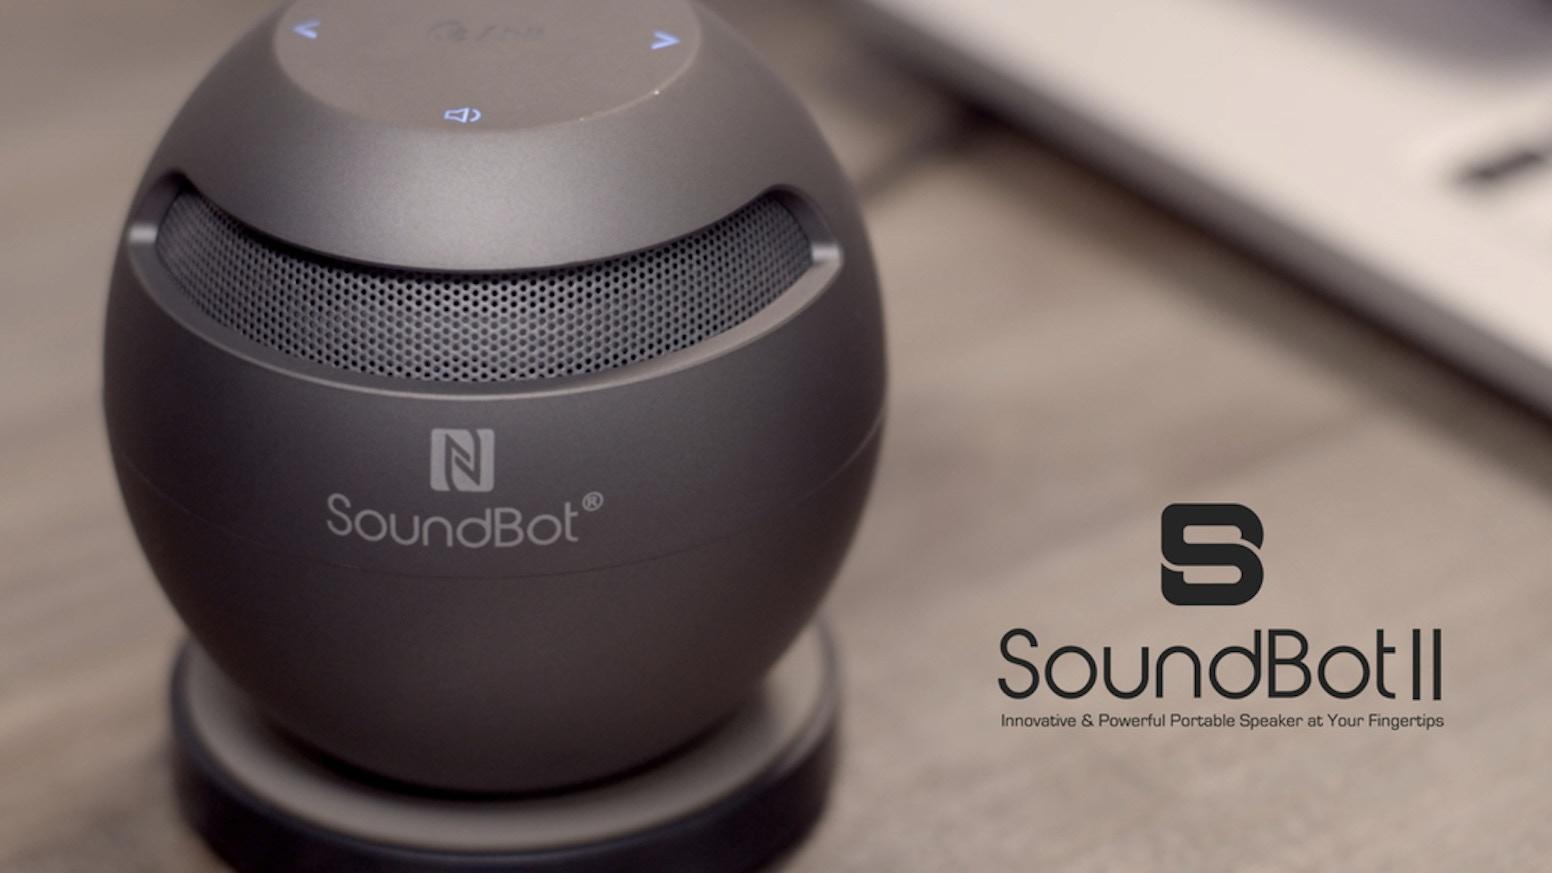 Revolutionary & Powerful High-Performance Premium Wireless Speakers for Everyone w/ Qi Wireless Charging, Bluetooth, Siri, Dynamic Bass